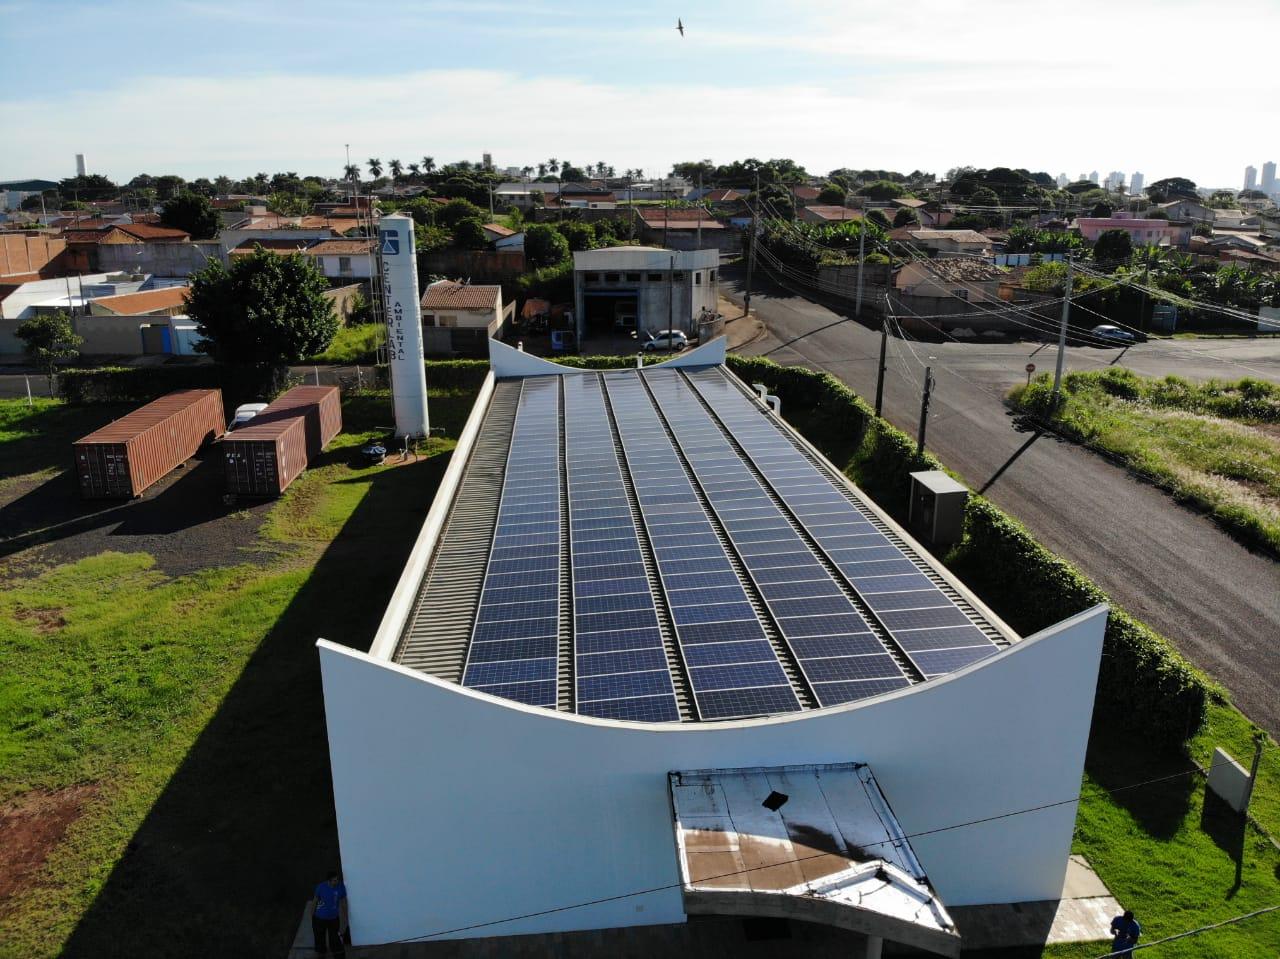 centerlab-energia-solar-fotovoltaica-araraquara-sao-carlos-matao4